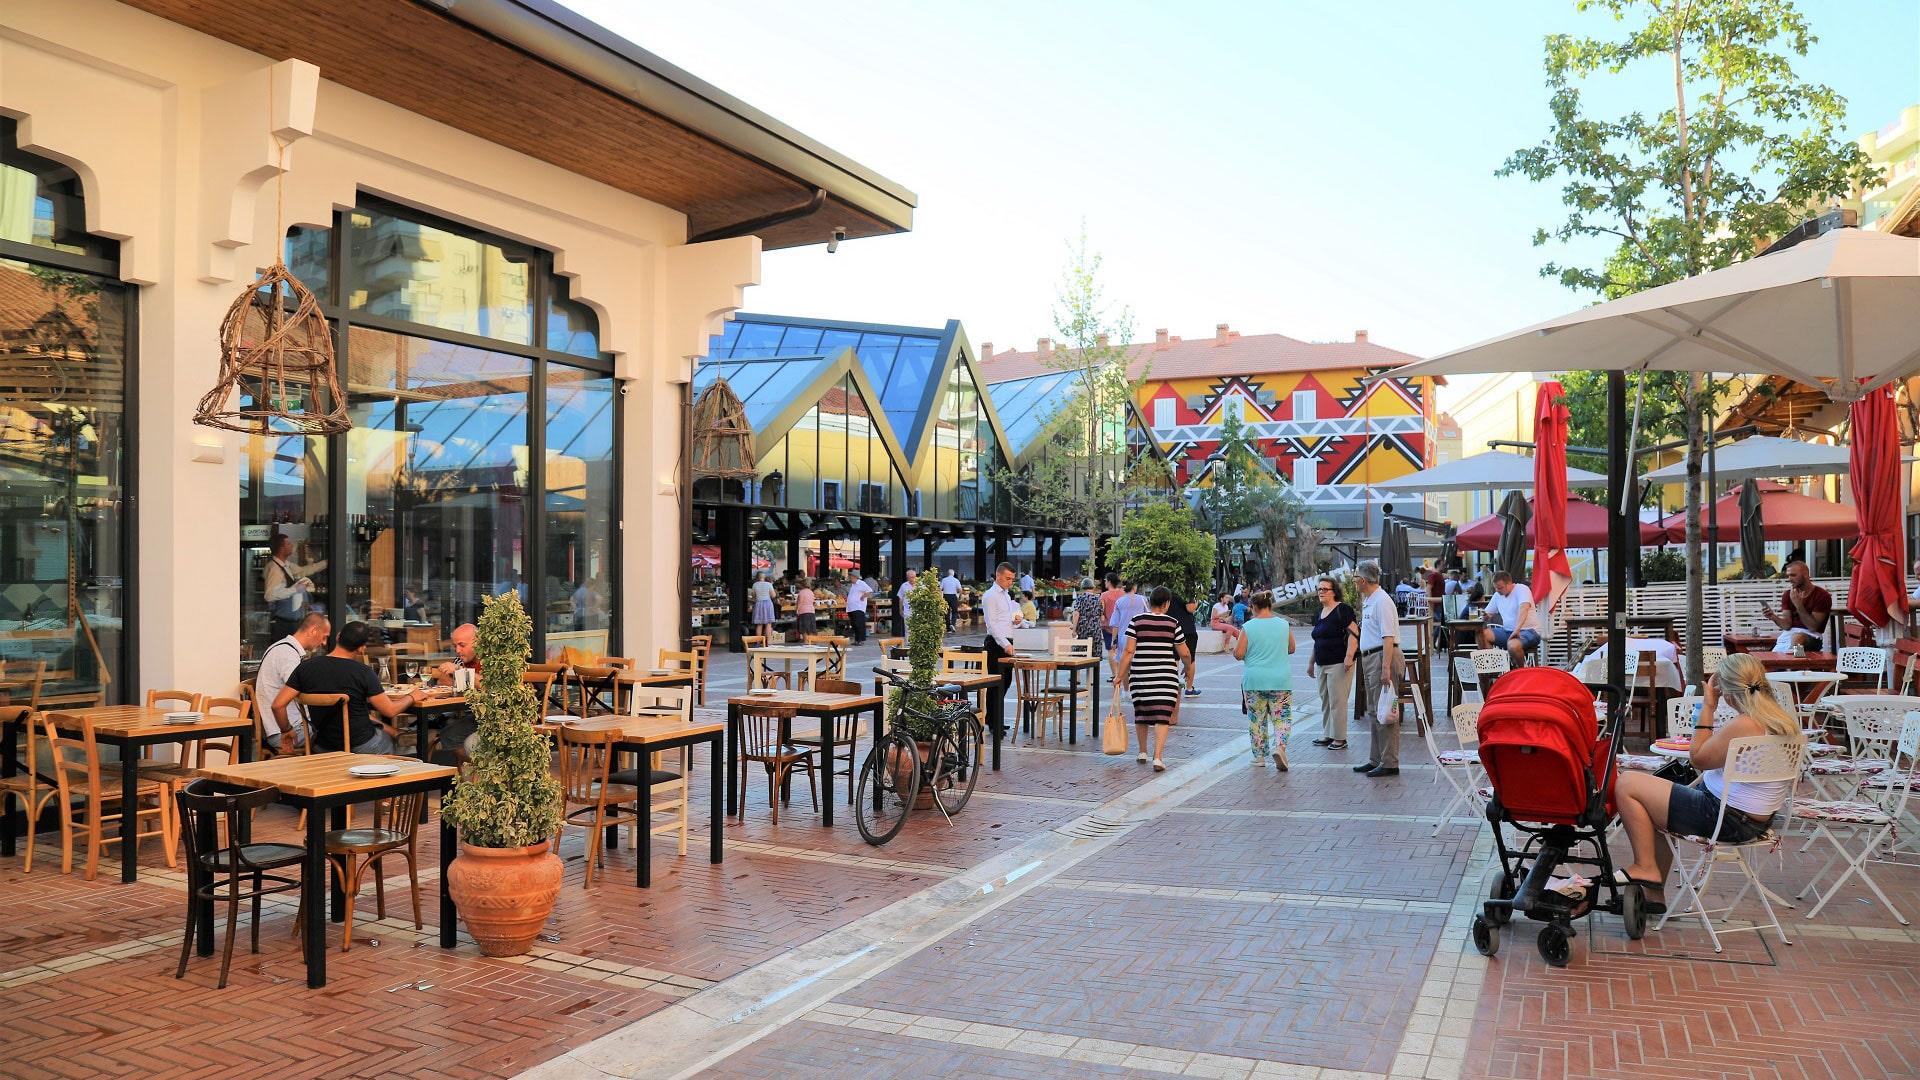 New-market-Bazaar-5-min